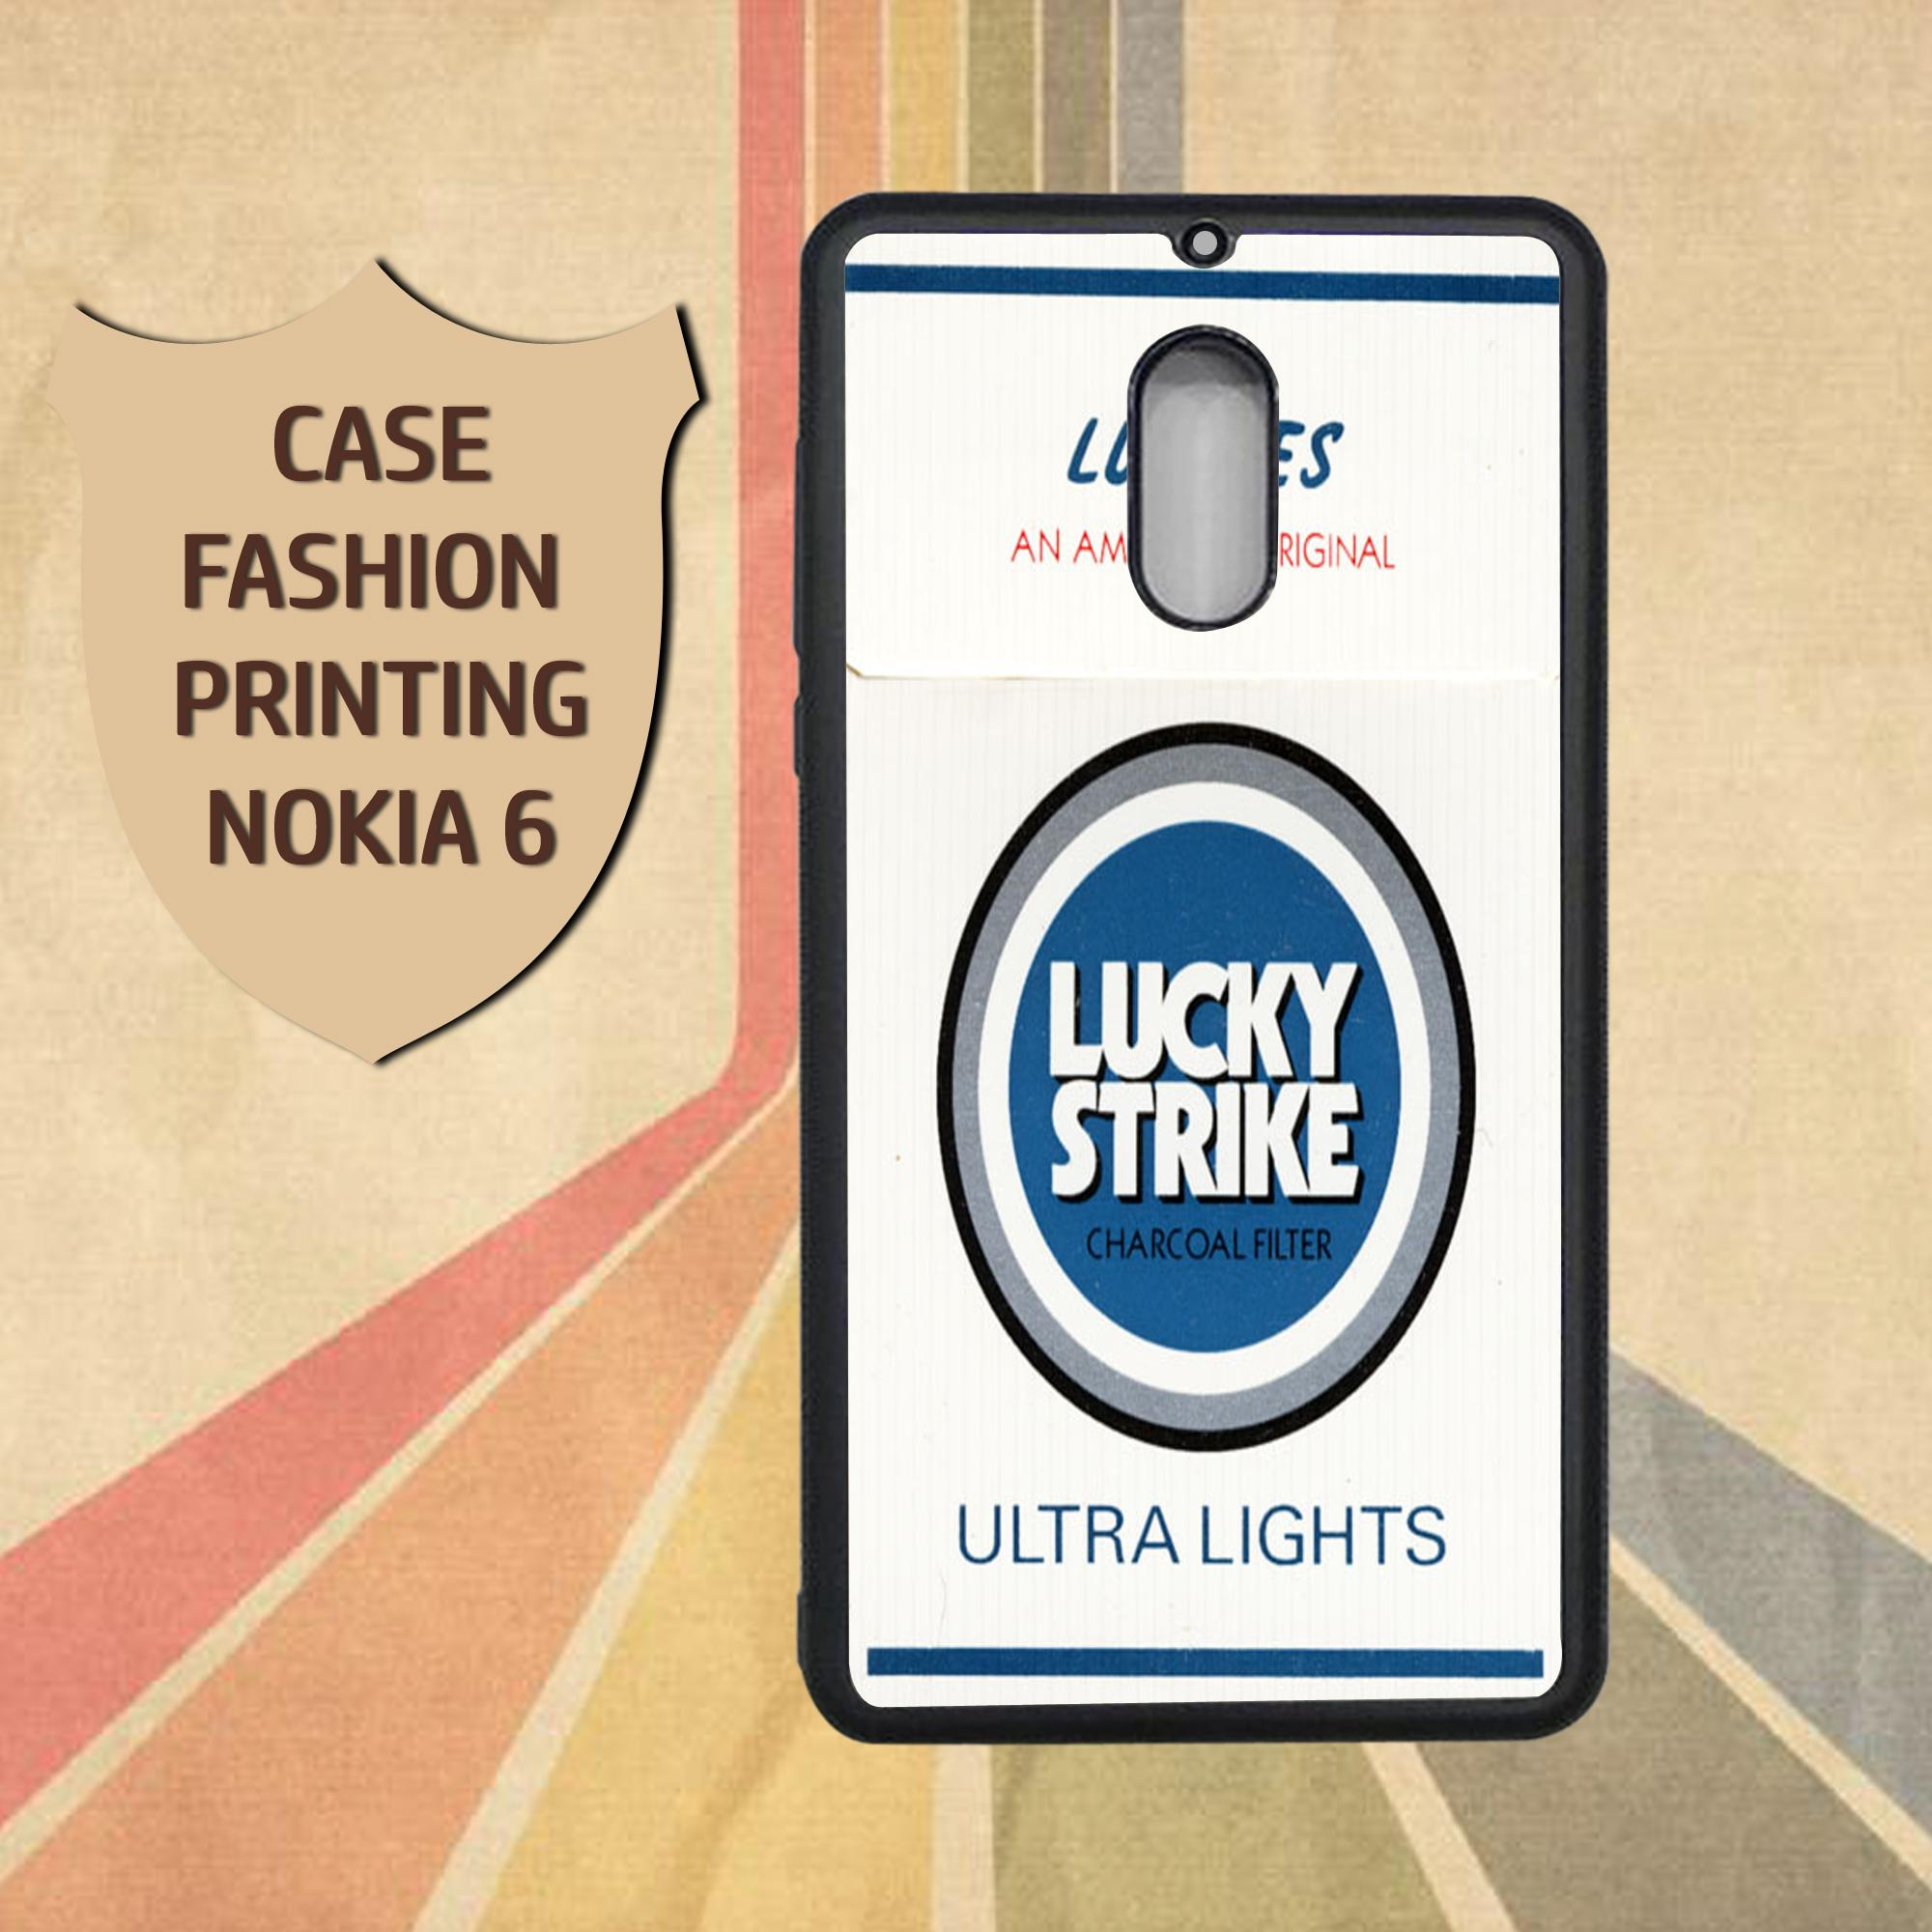 Rajamurah fasion printing case Nokia6 - 15